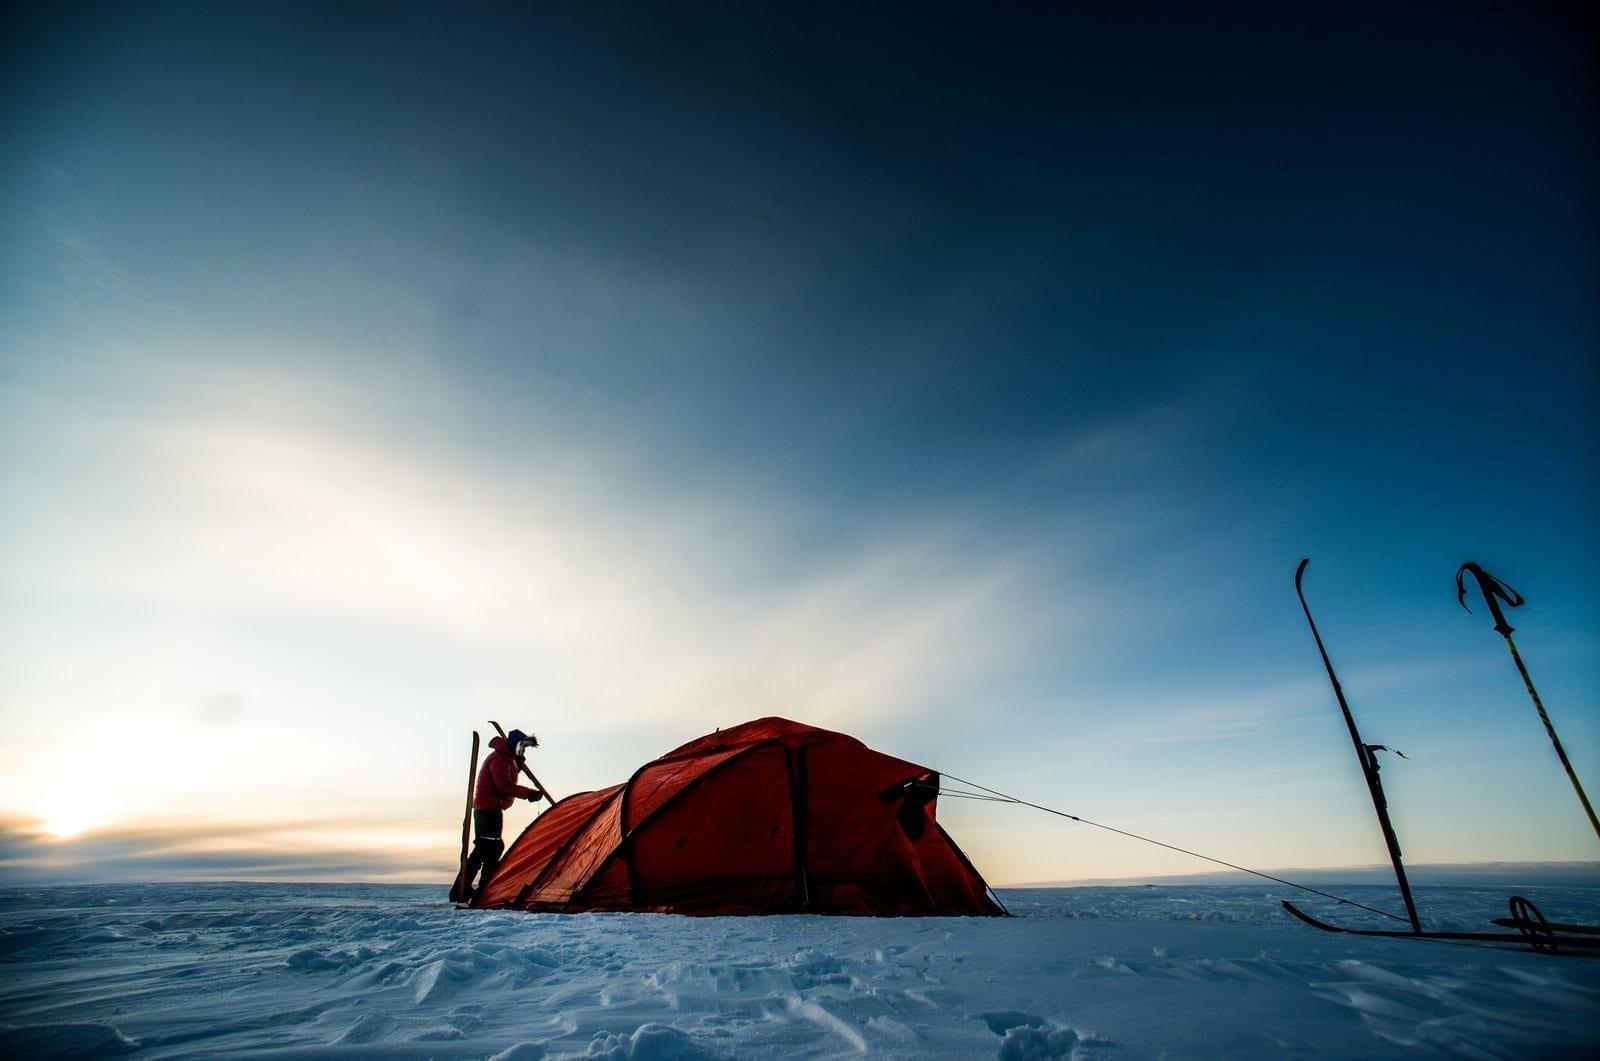 greenland tent